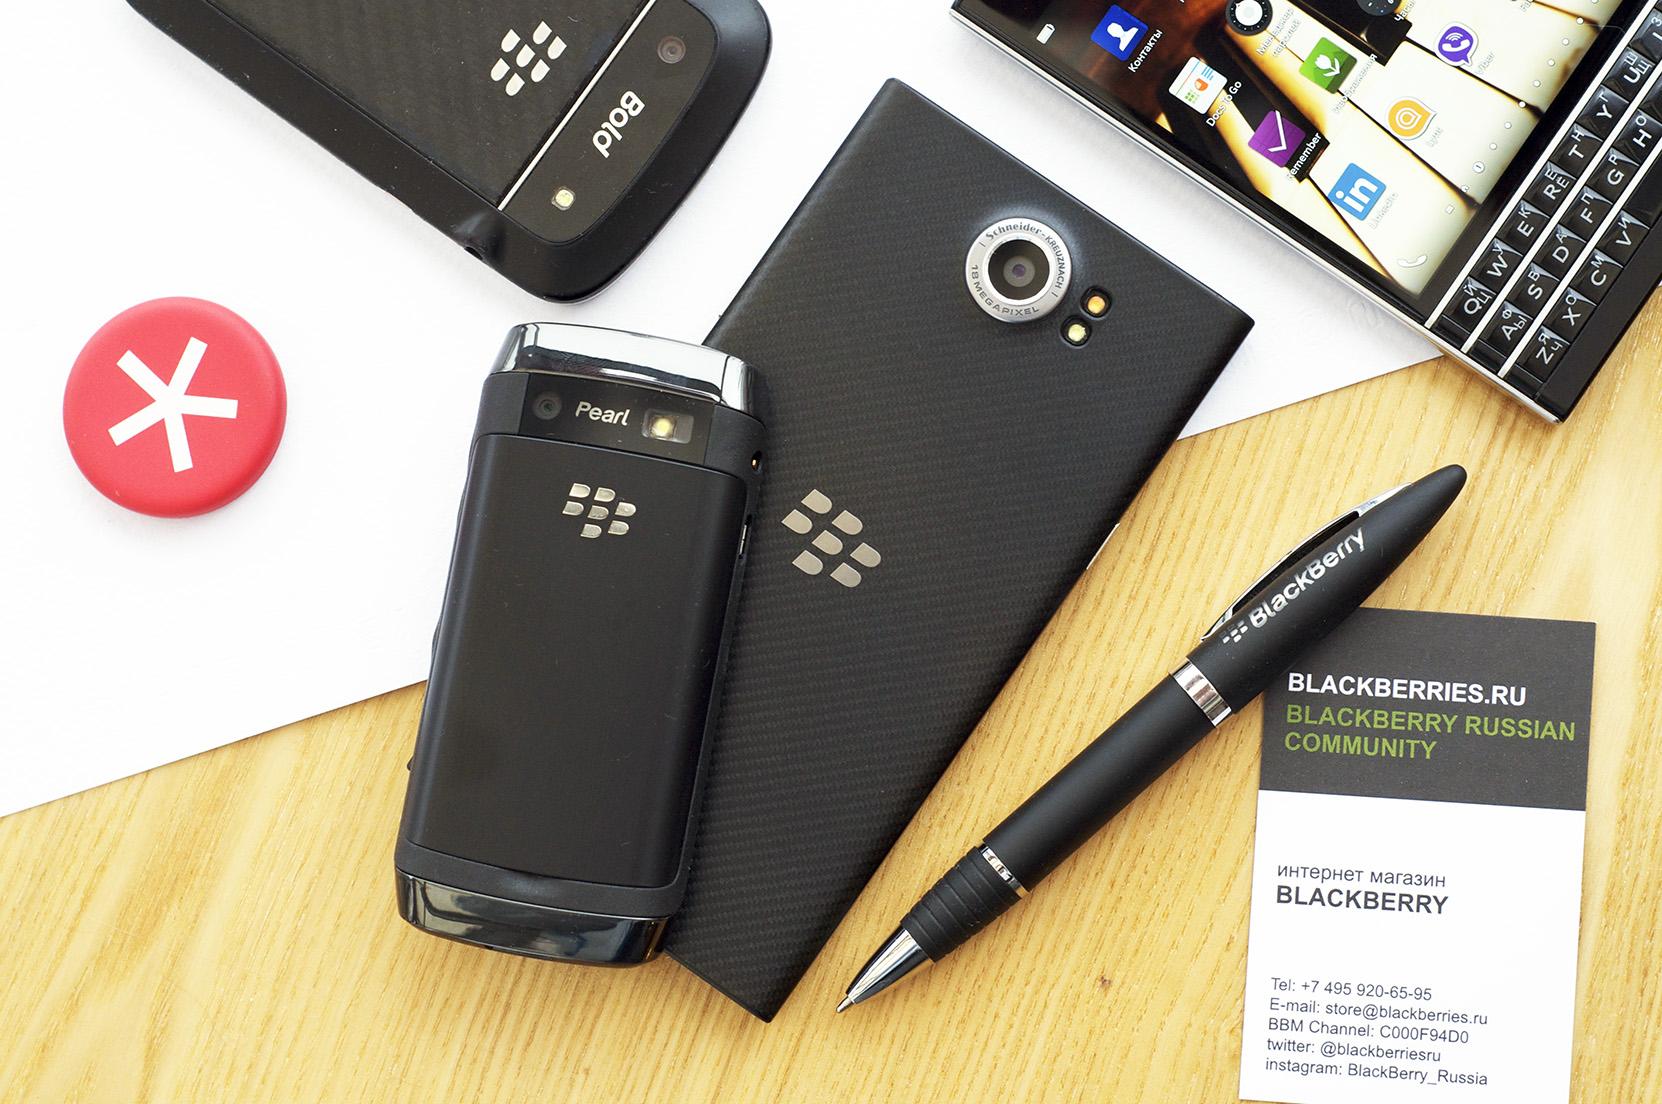 blackberry-9100-pearl-3g-26